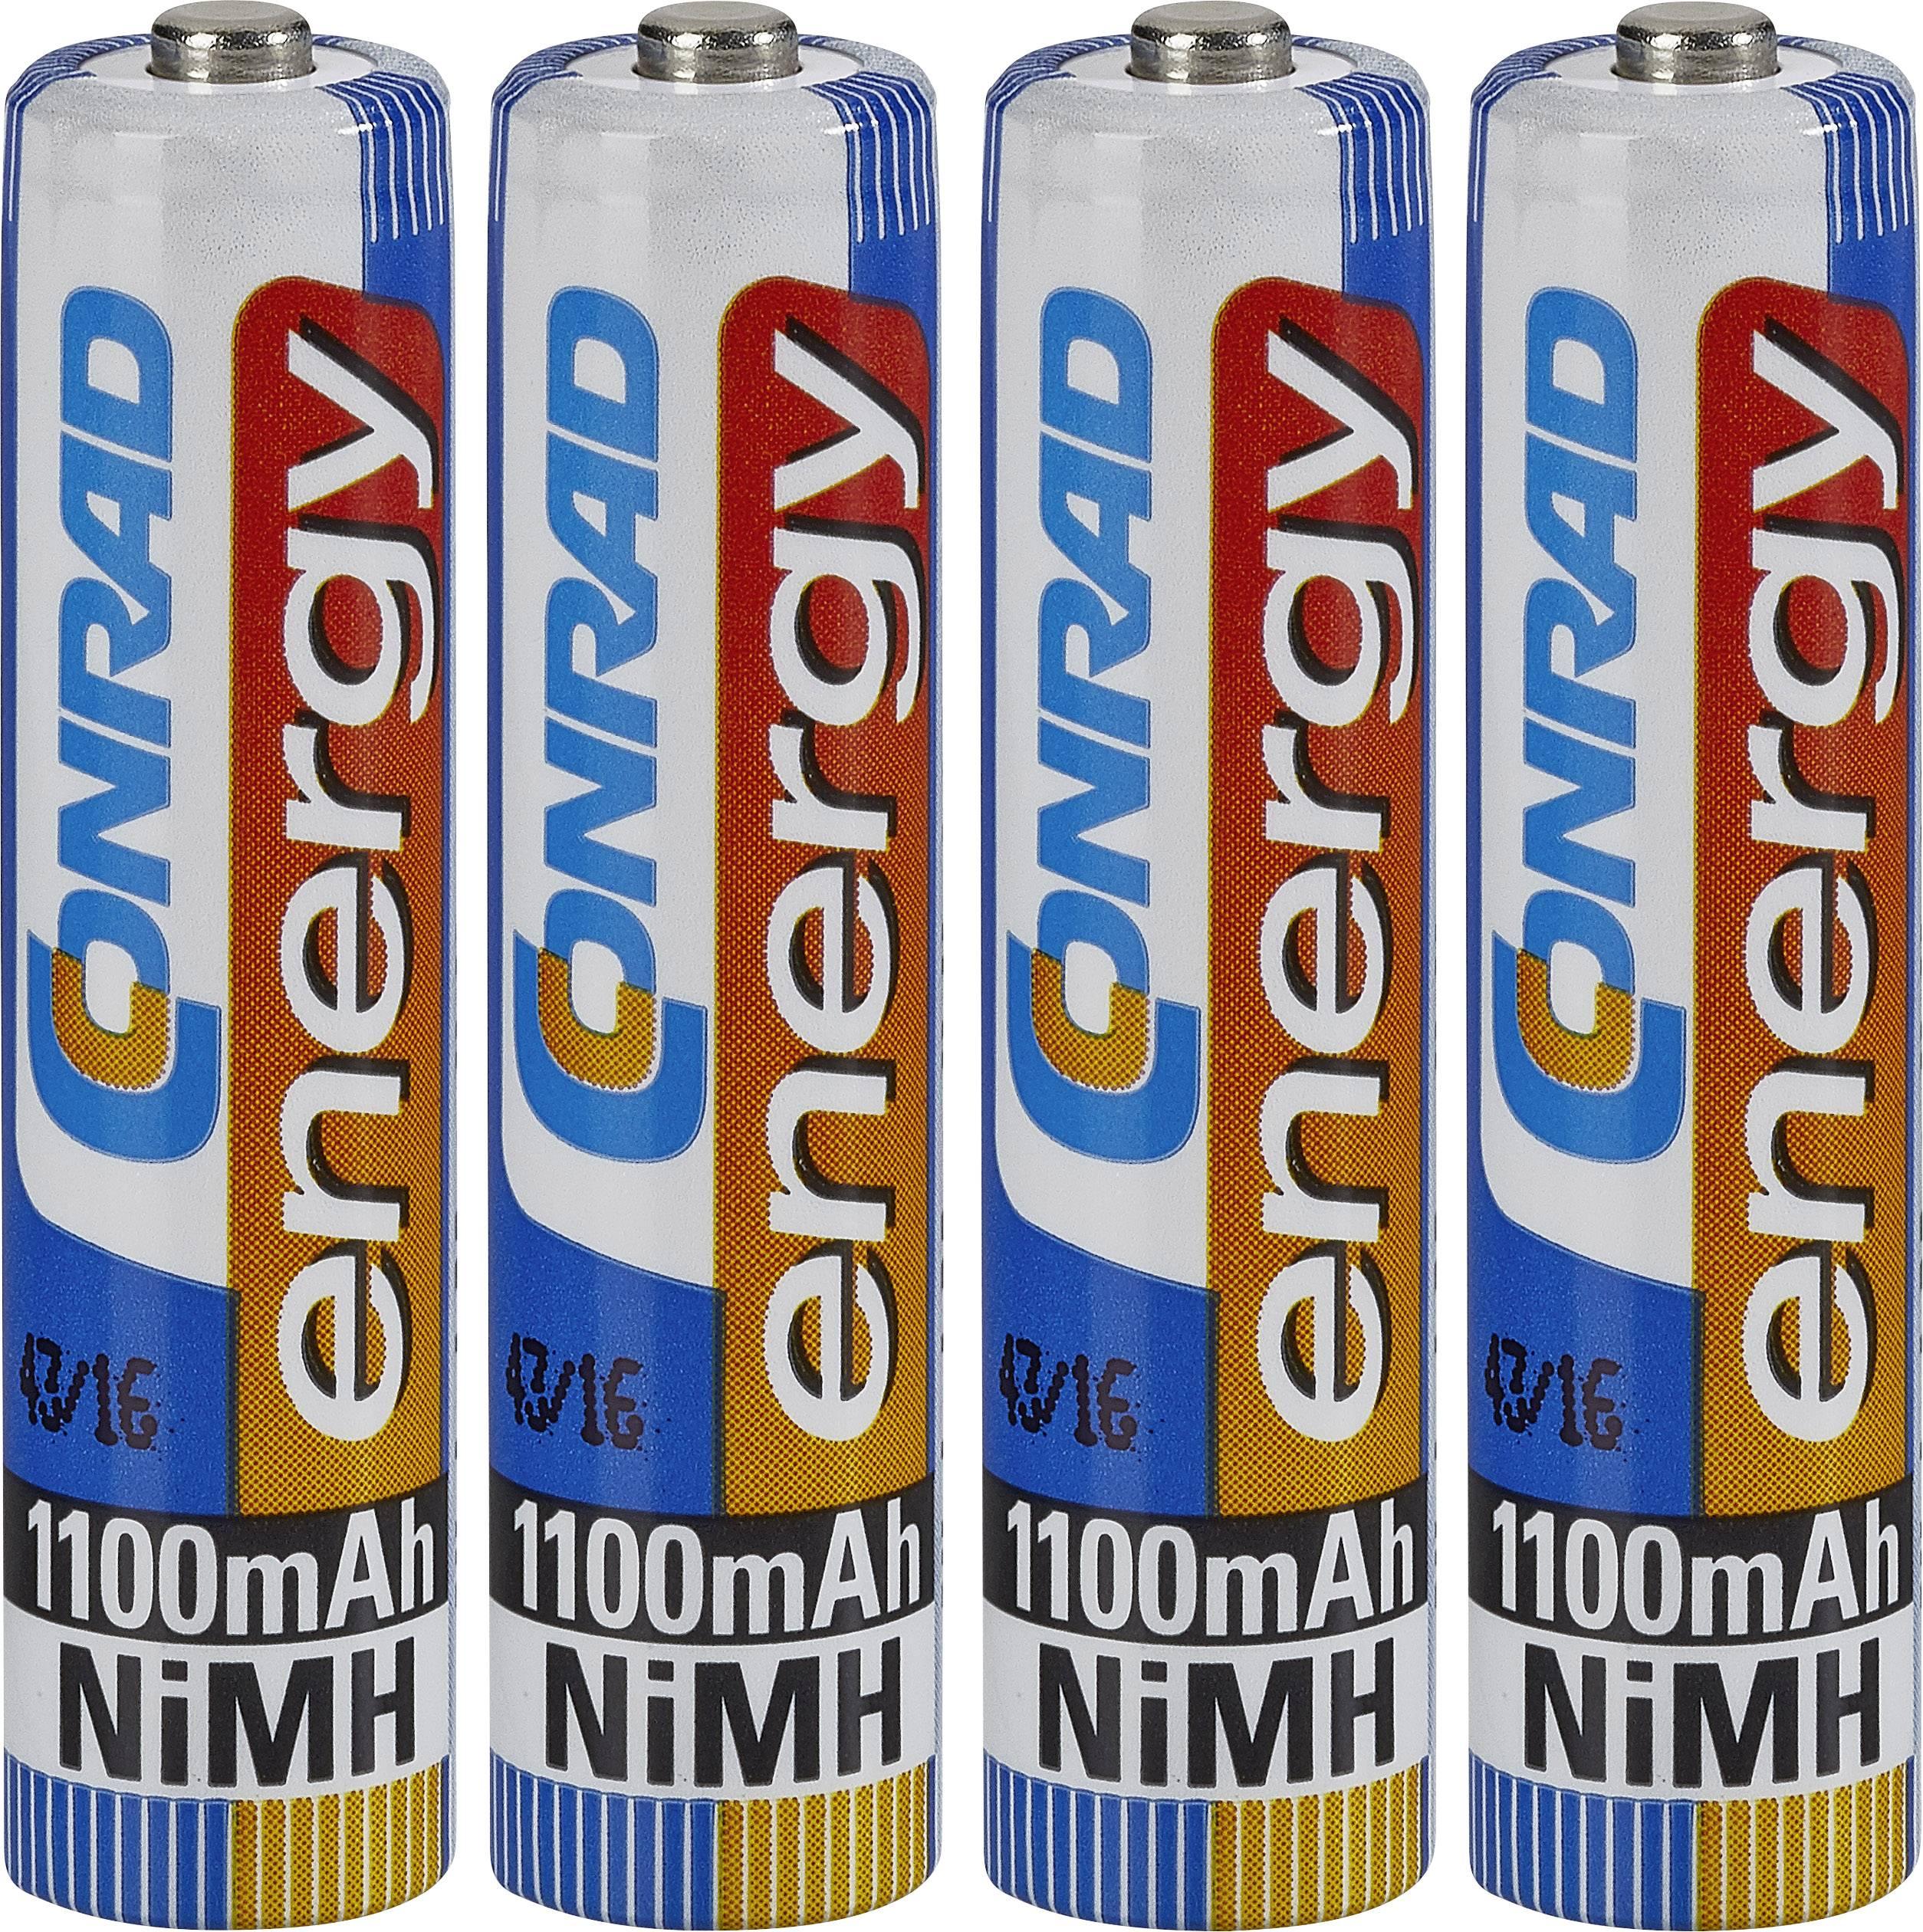 Mikrotužkový akumulátor typu AAA NiMH Conrad energy HR03 251111, 1100 mAh, 1.2 V, 4 ks